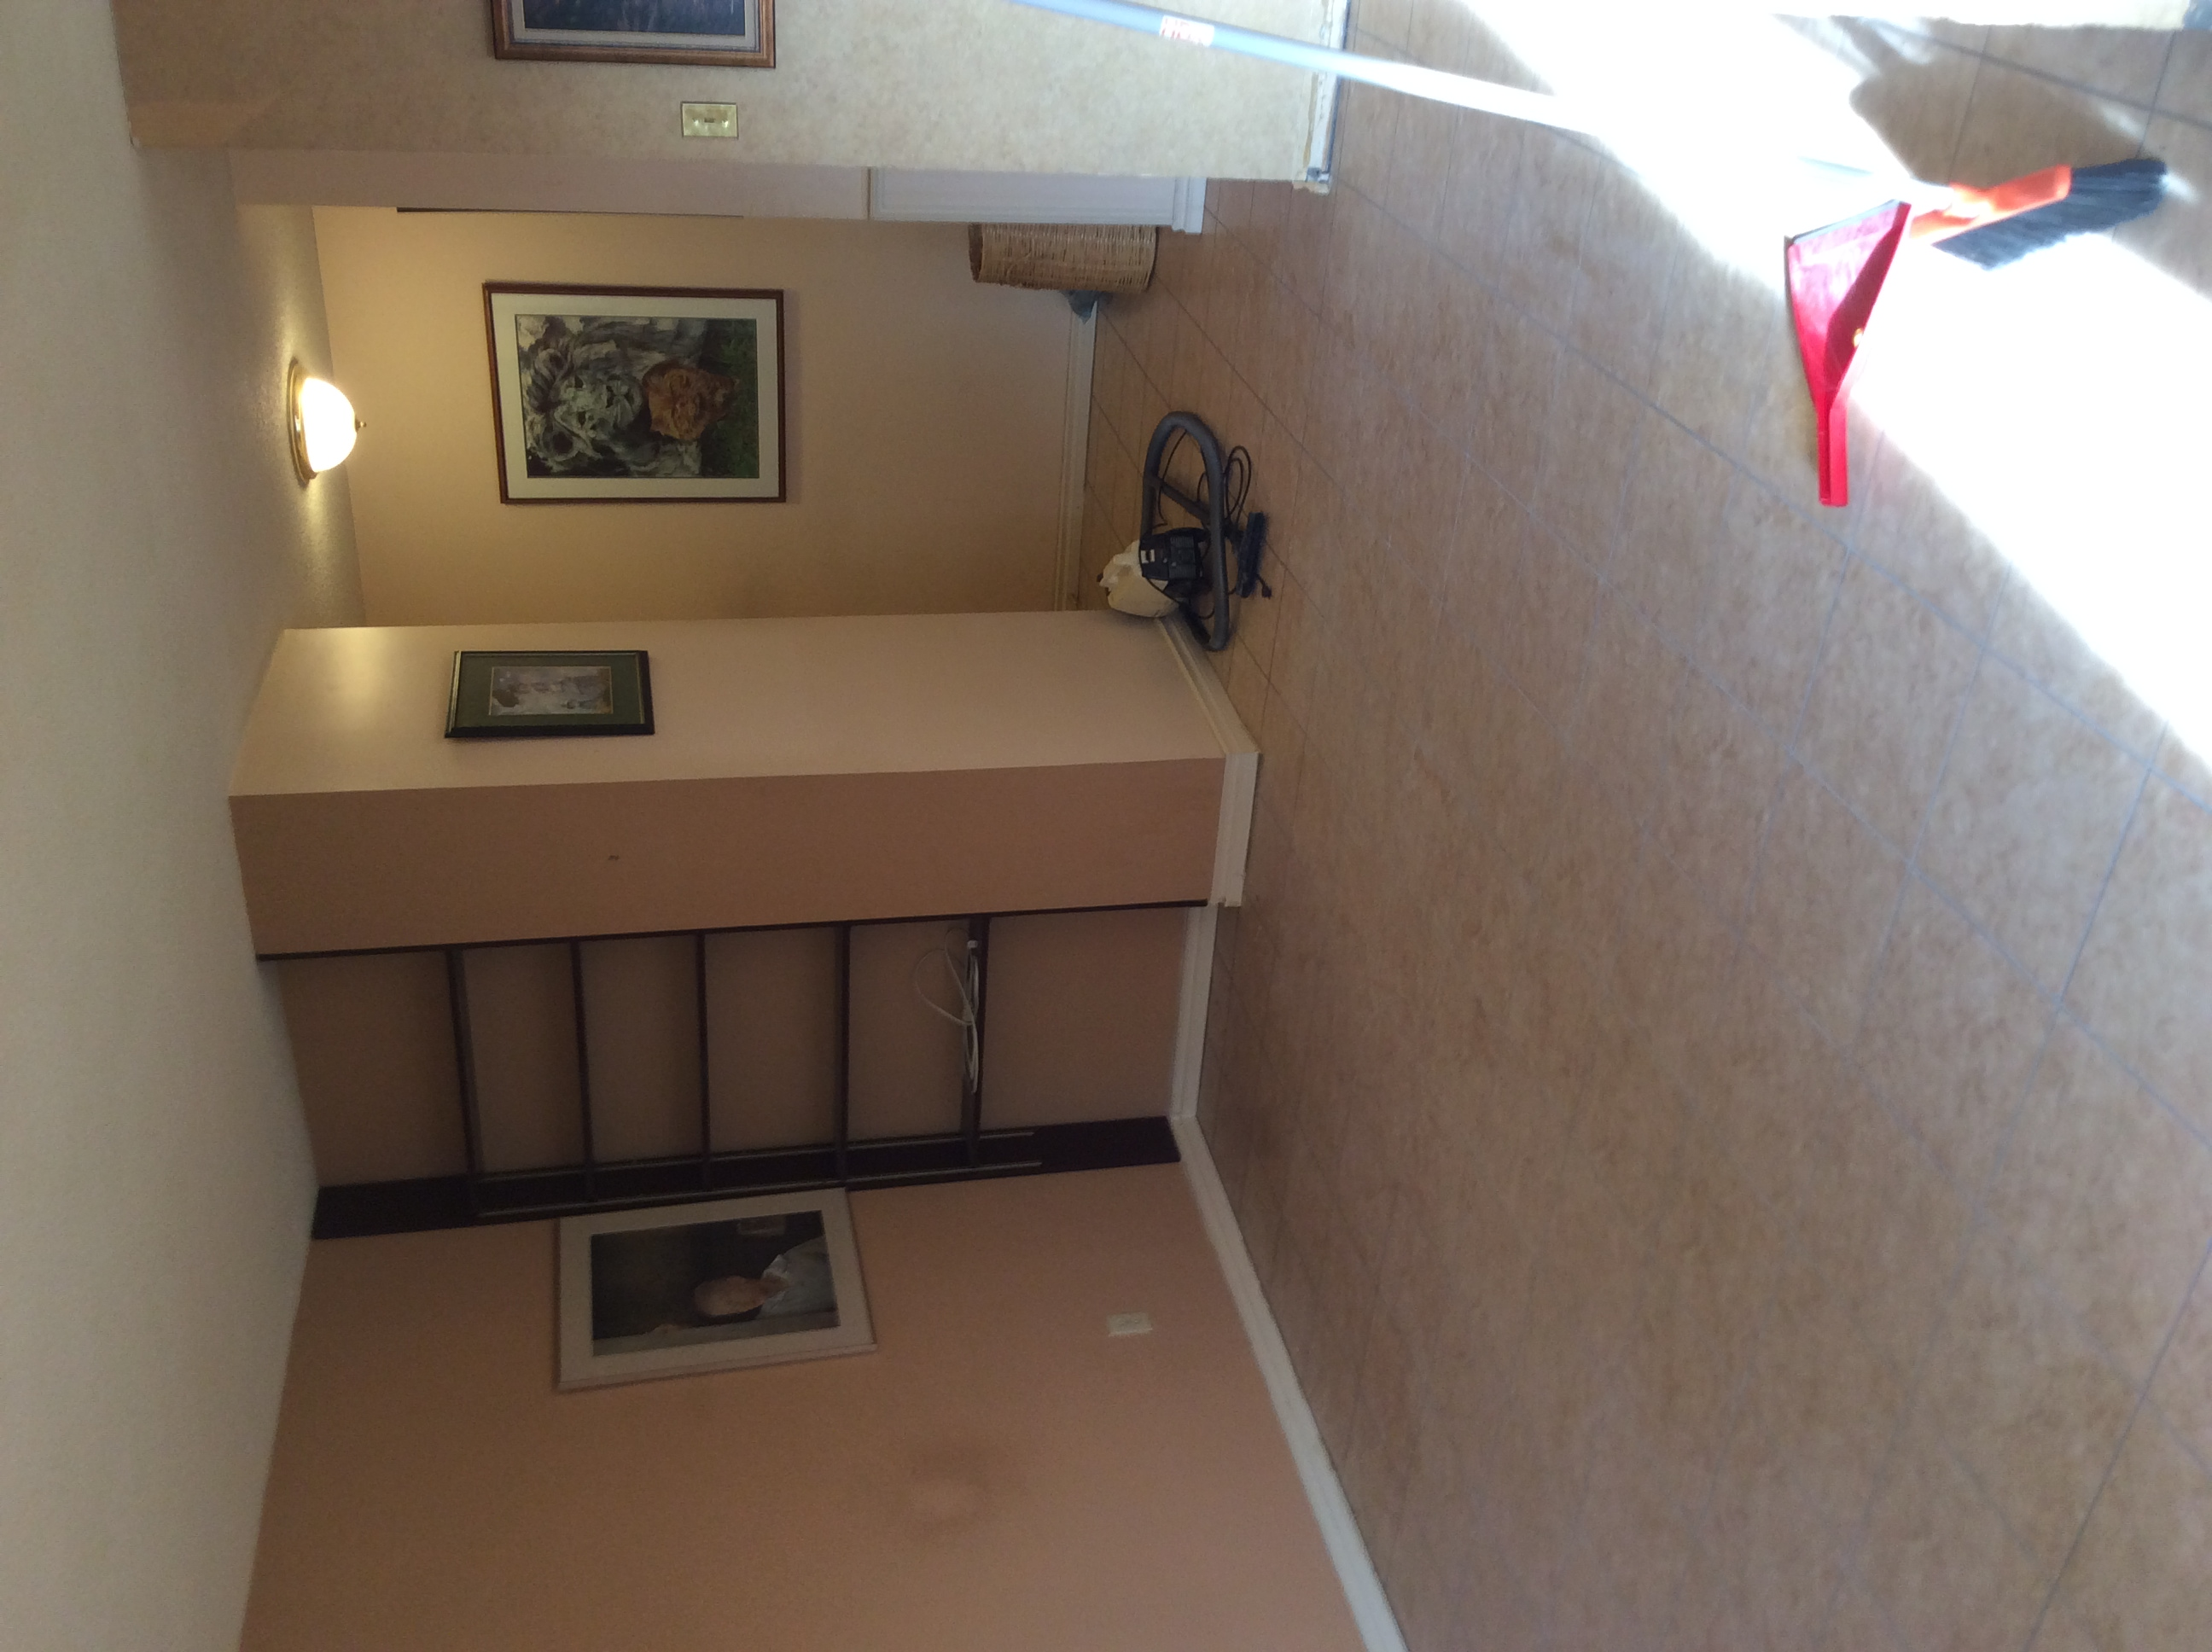 Inglewood Condo Living Room Before